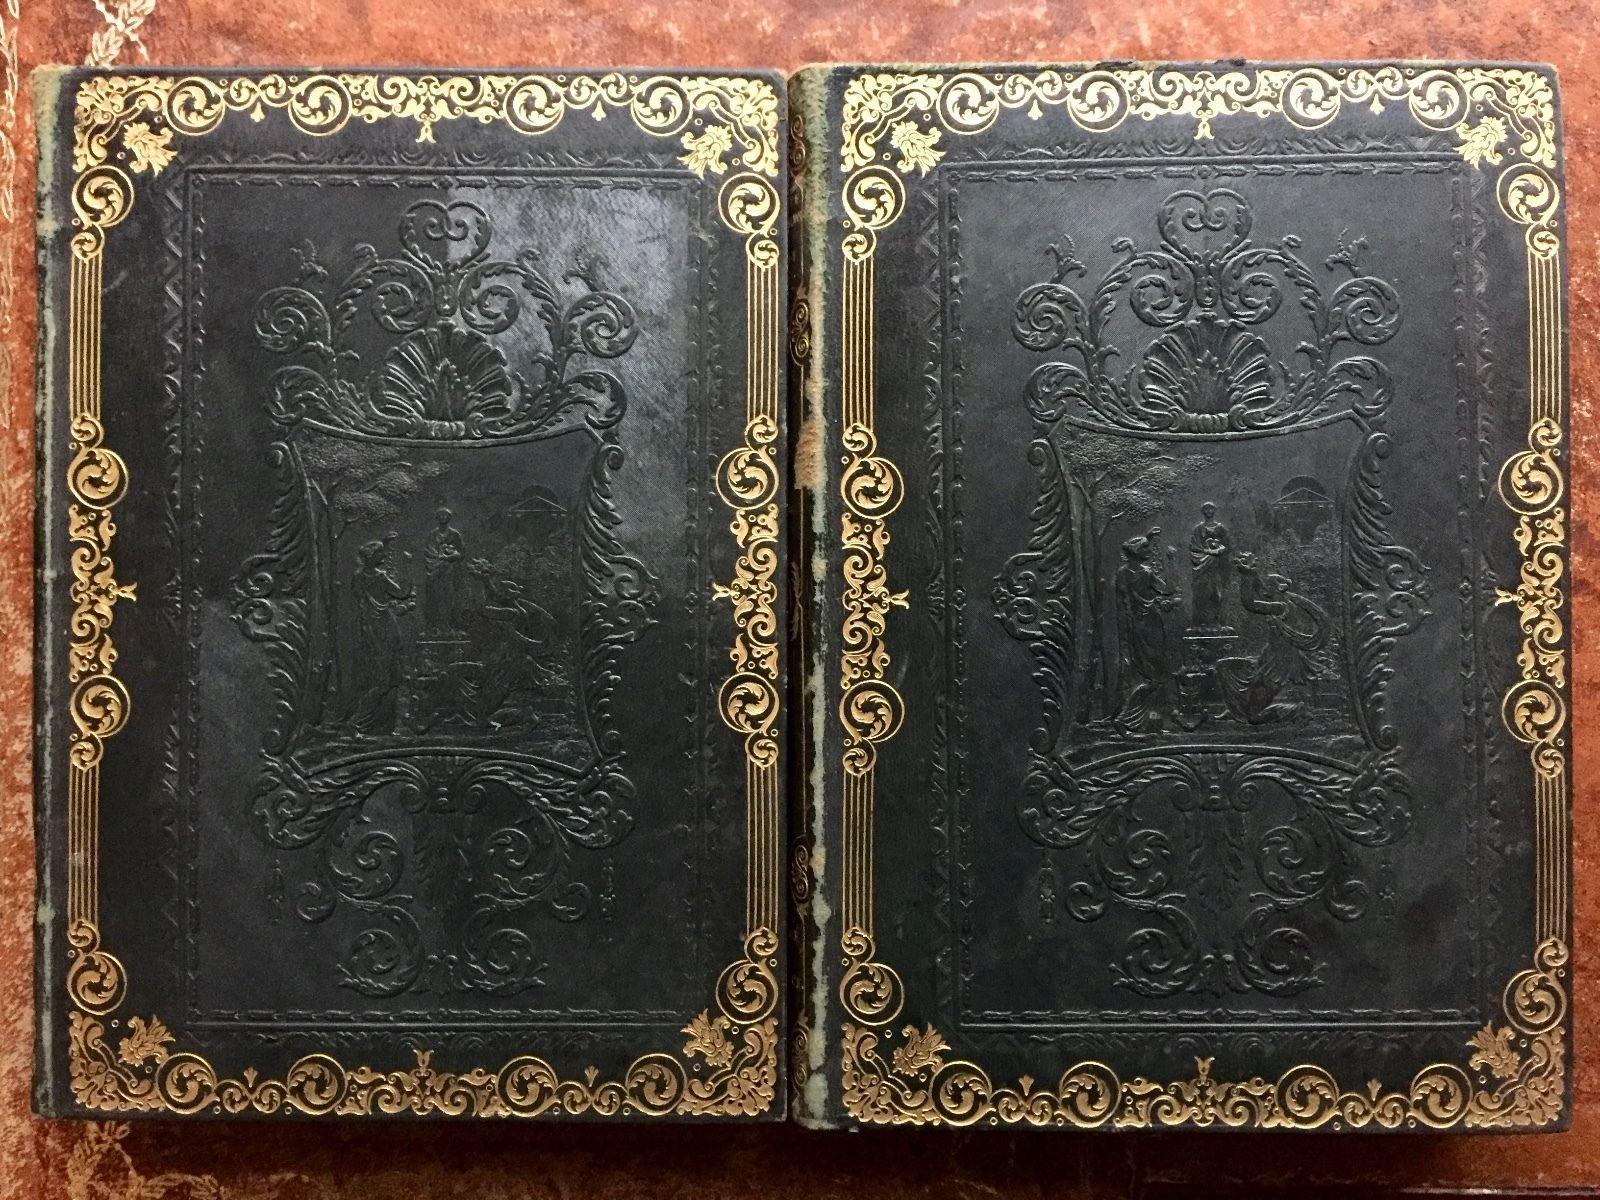 Landscape Illustrations of the Waverley Novels in 2 Vols 1832 - Stunning Set https://t.co/jlbck5yADB https://t.co/xpw1itet8V